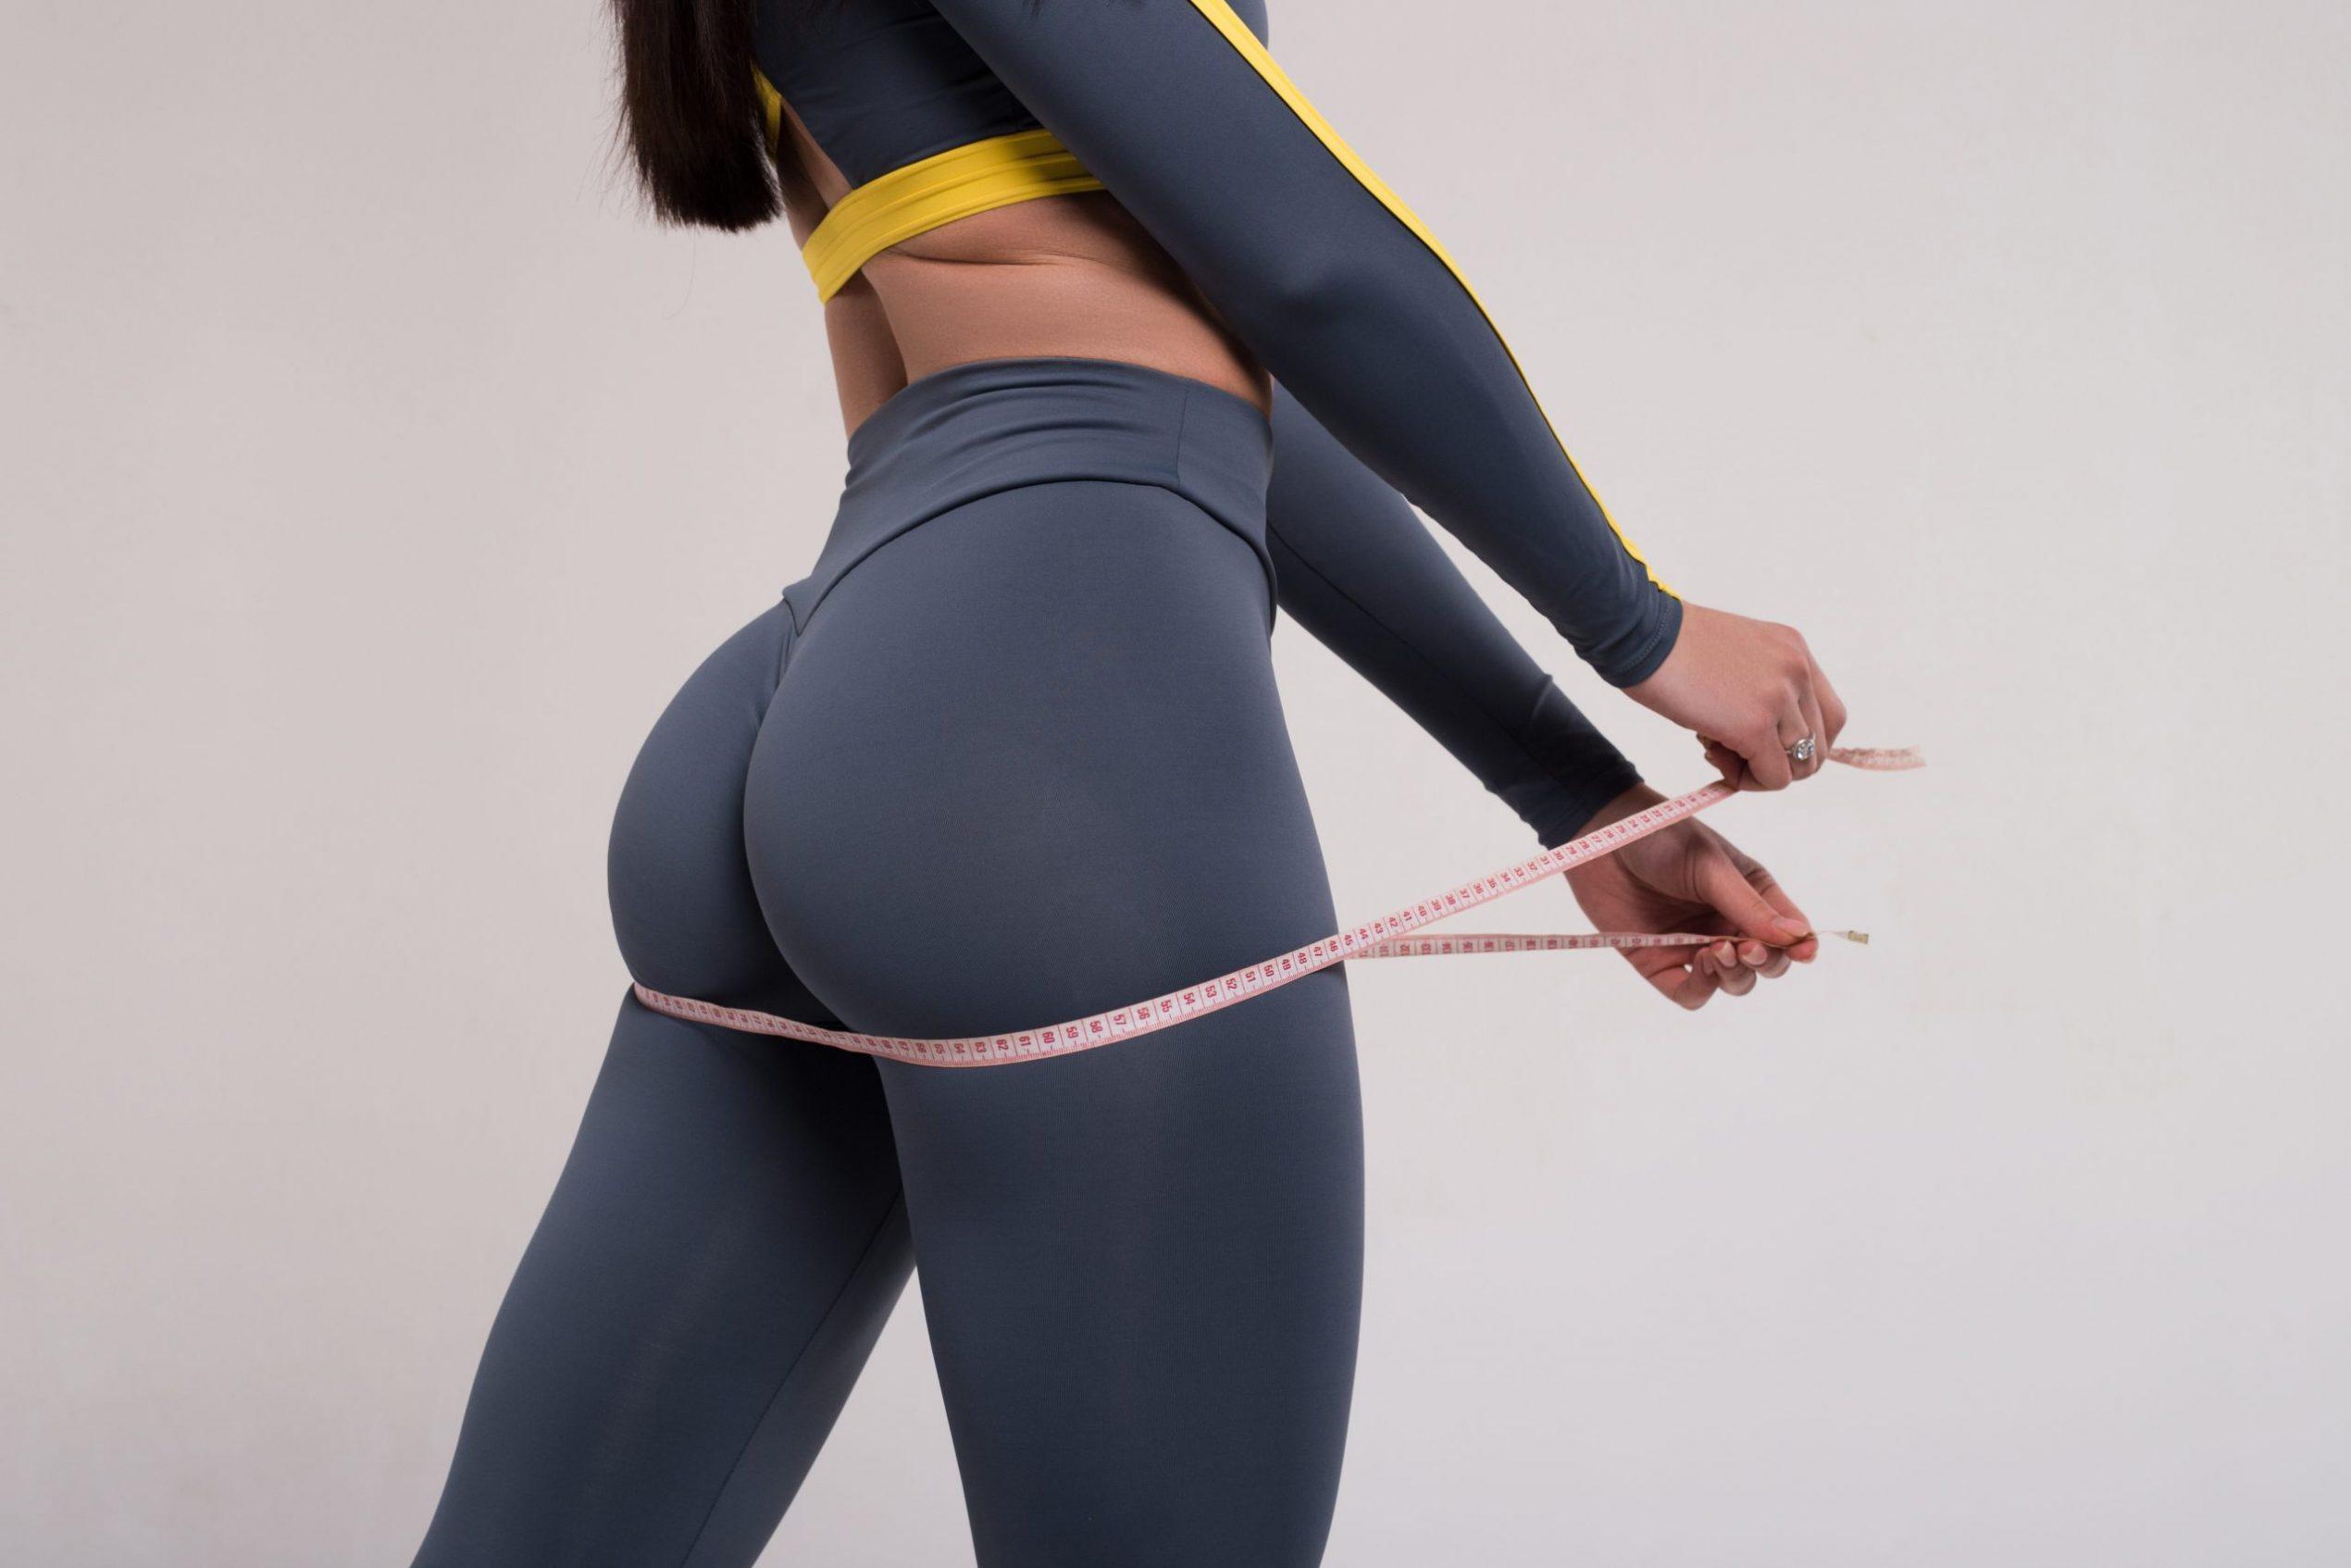 Product Female For Enhancer Butt Size, Let You Have Big Big Ass Butt Enhancement Cream